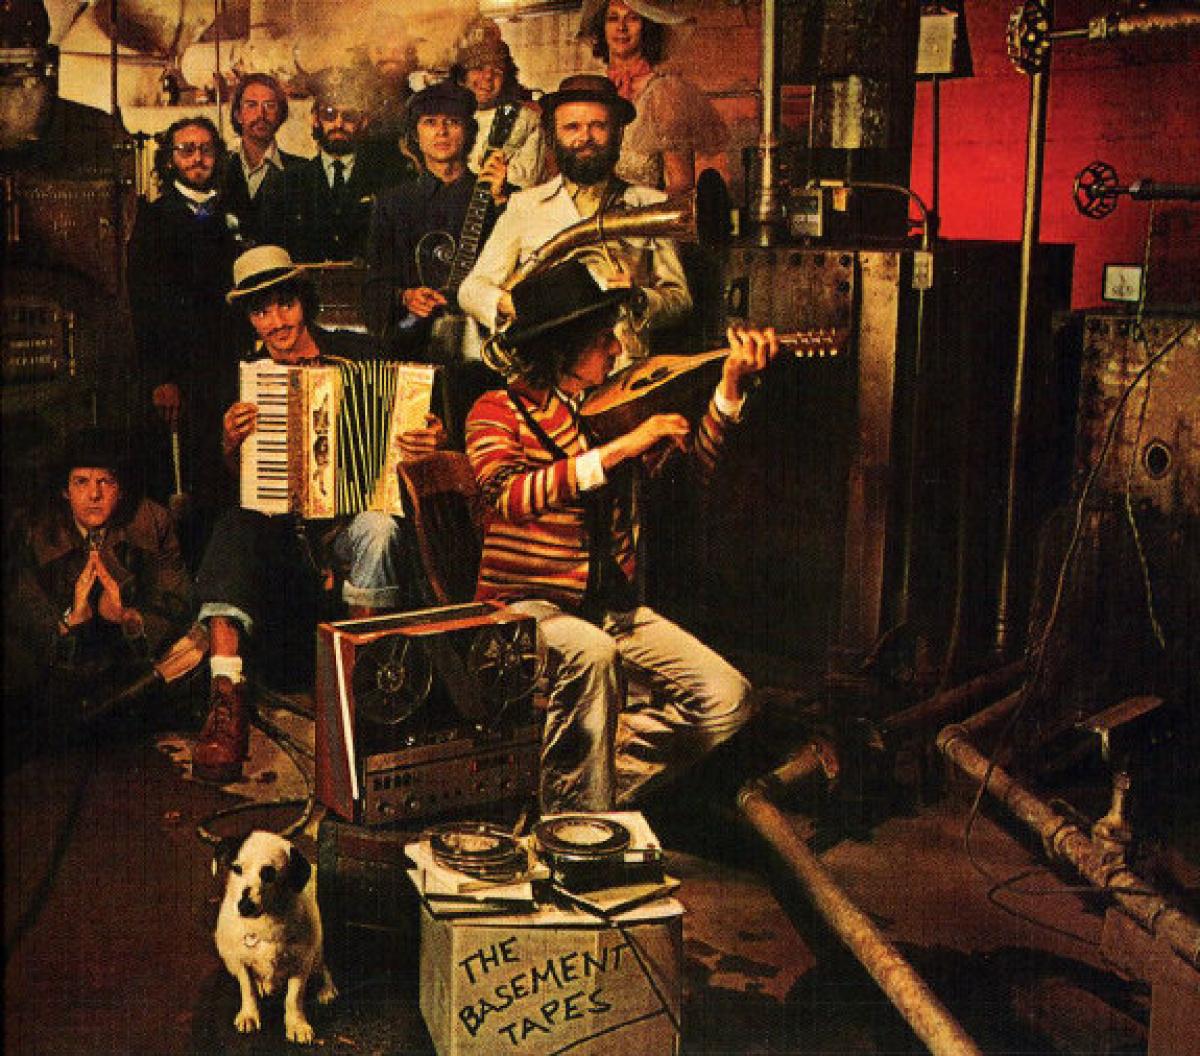 music review the band week bob dylan the basement tapes rh boredanddangerousblog wordpress com